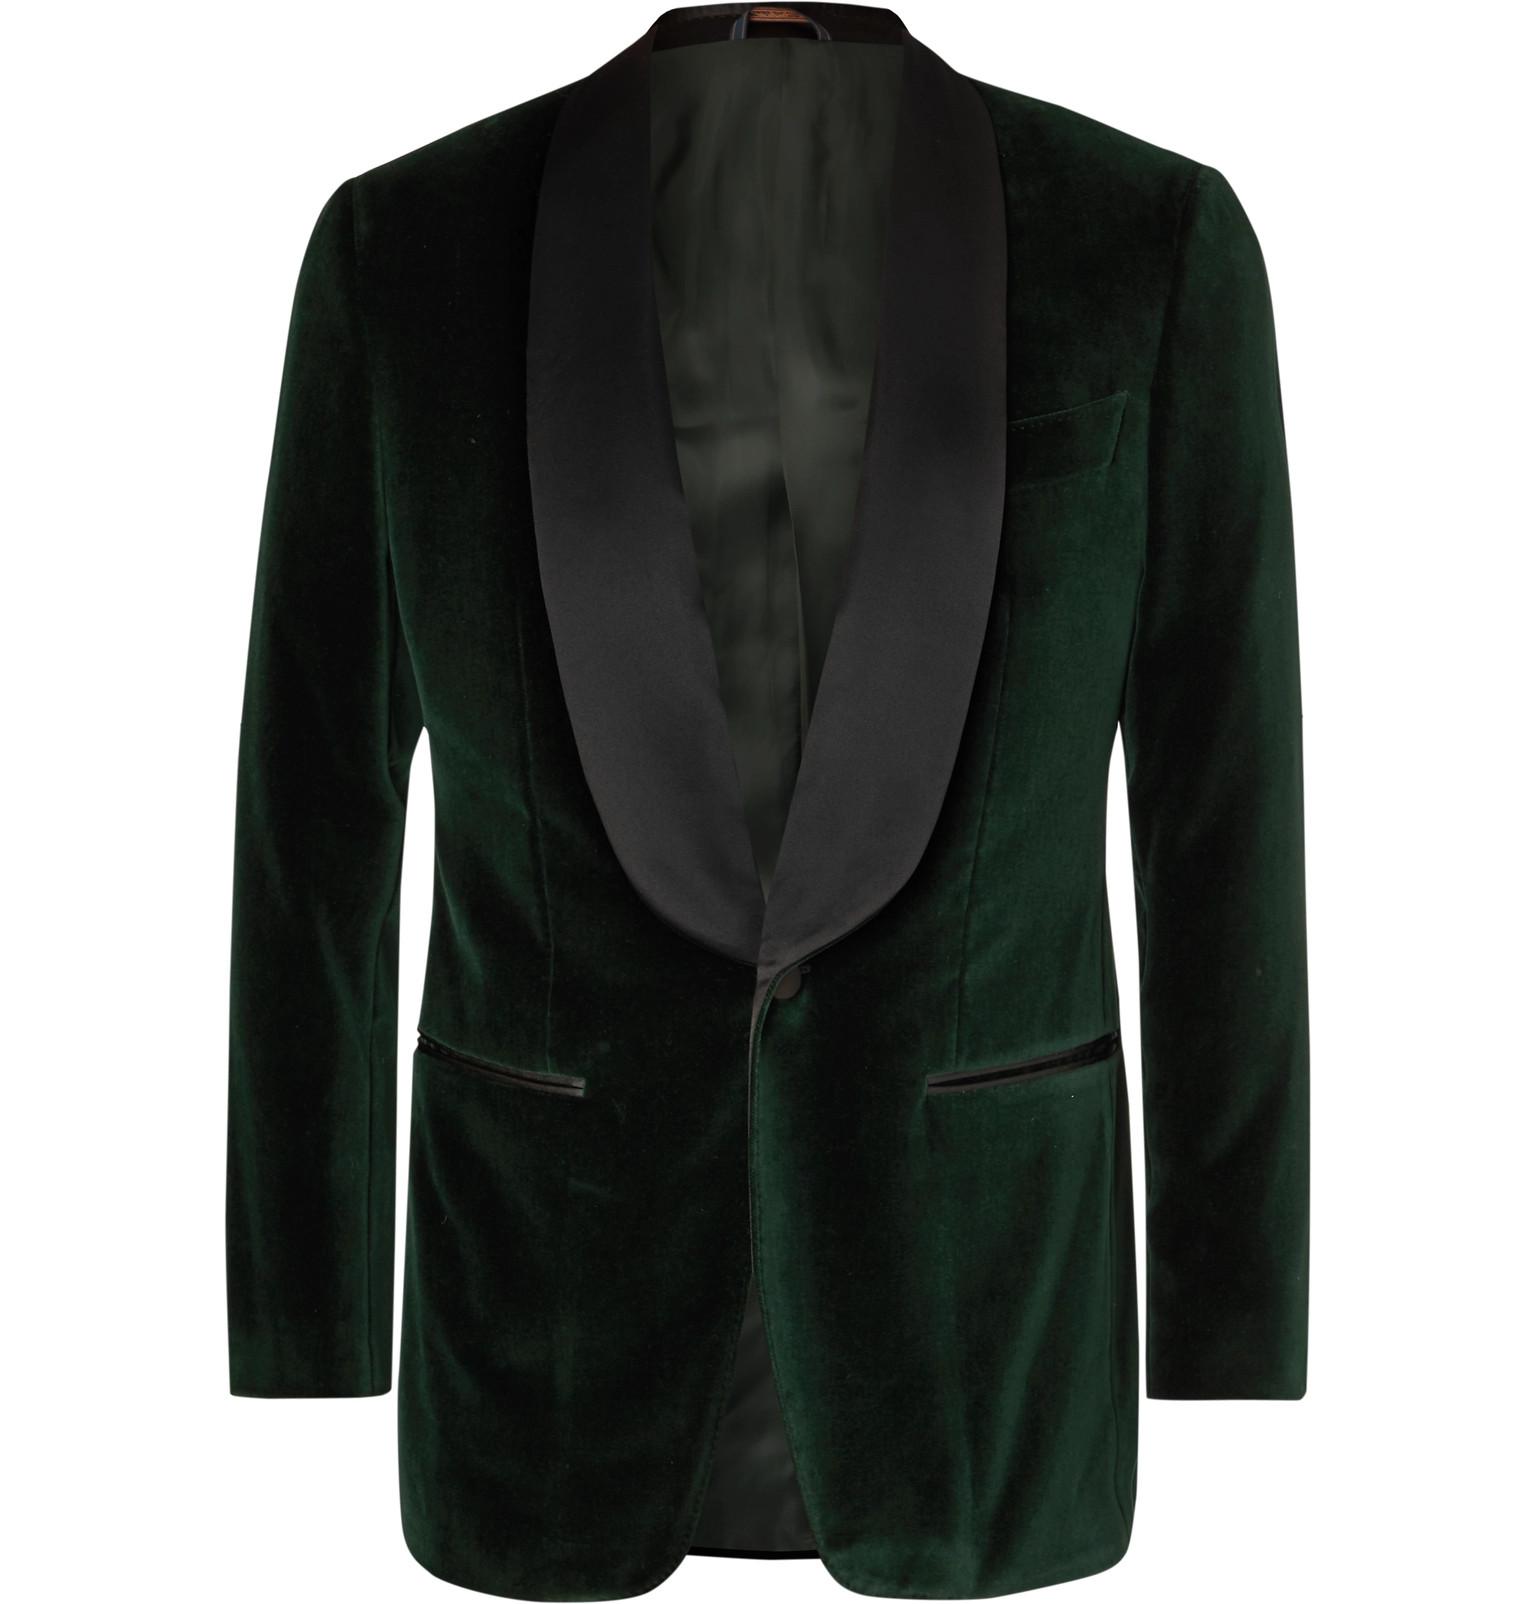 0d21910b4f1 Thom SweeneyDark-Green Slim-Fit Satin-Trimmed Cotton-Velvet Tuxedo Jacket